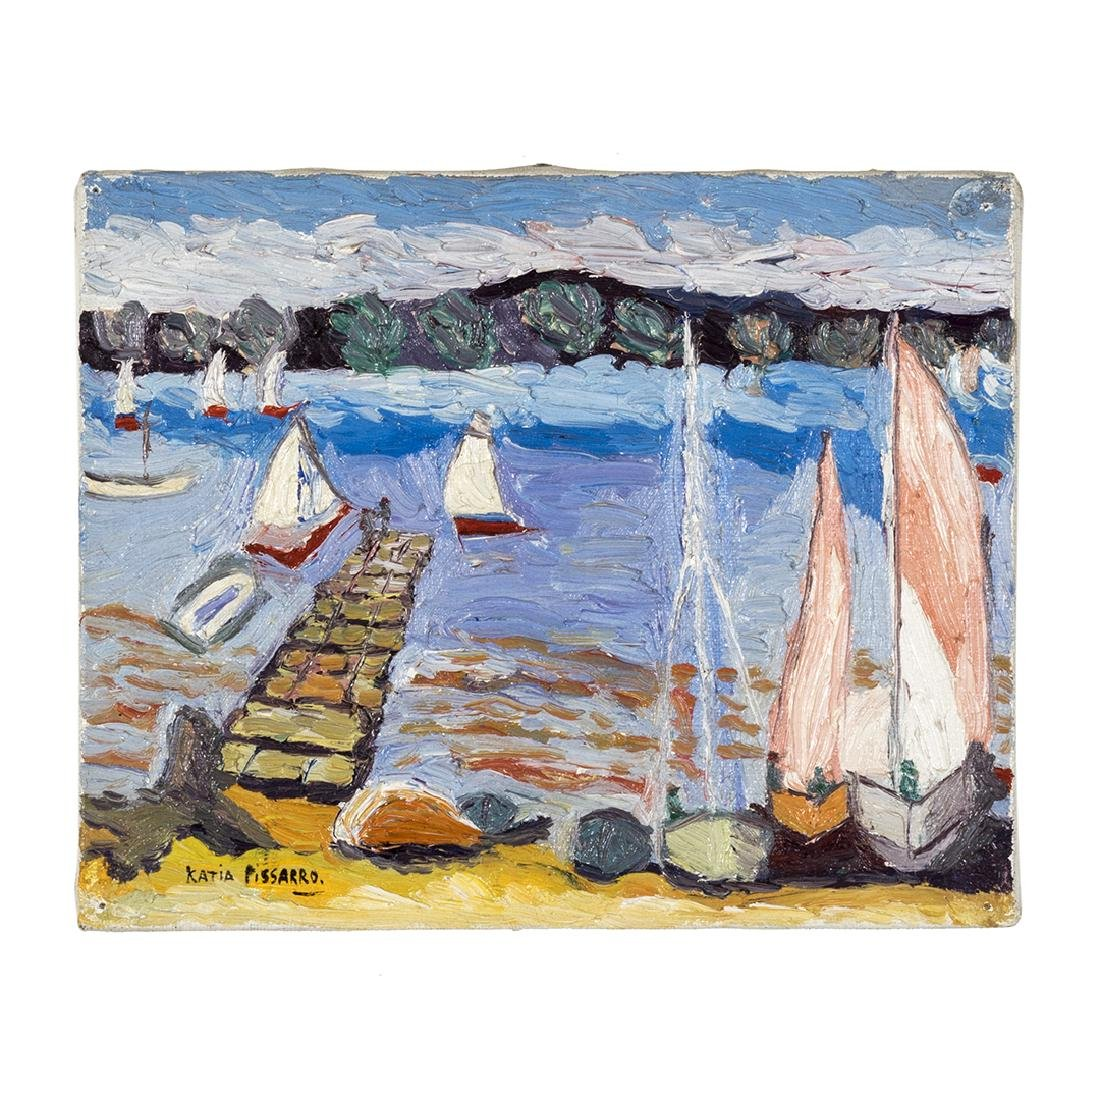 Katia Pissarro St. Halo Oil Painting